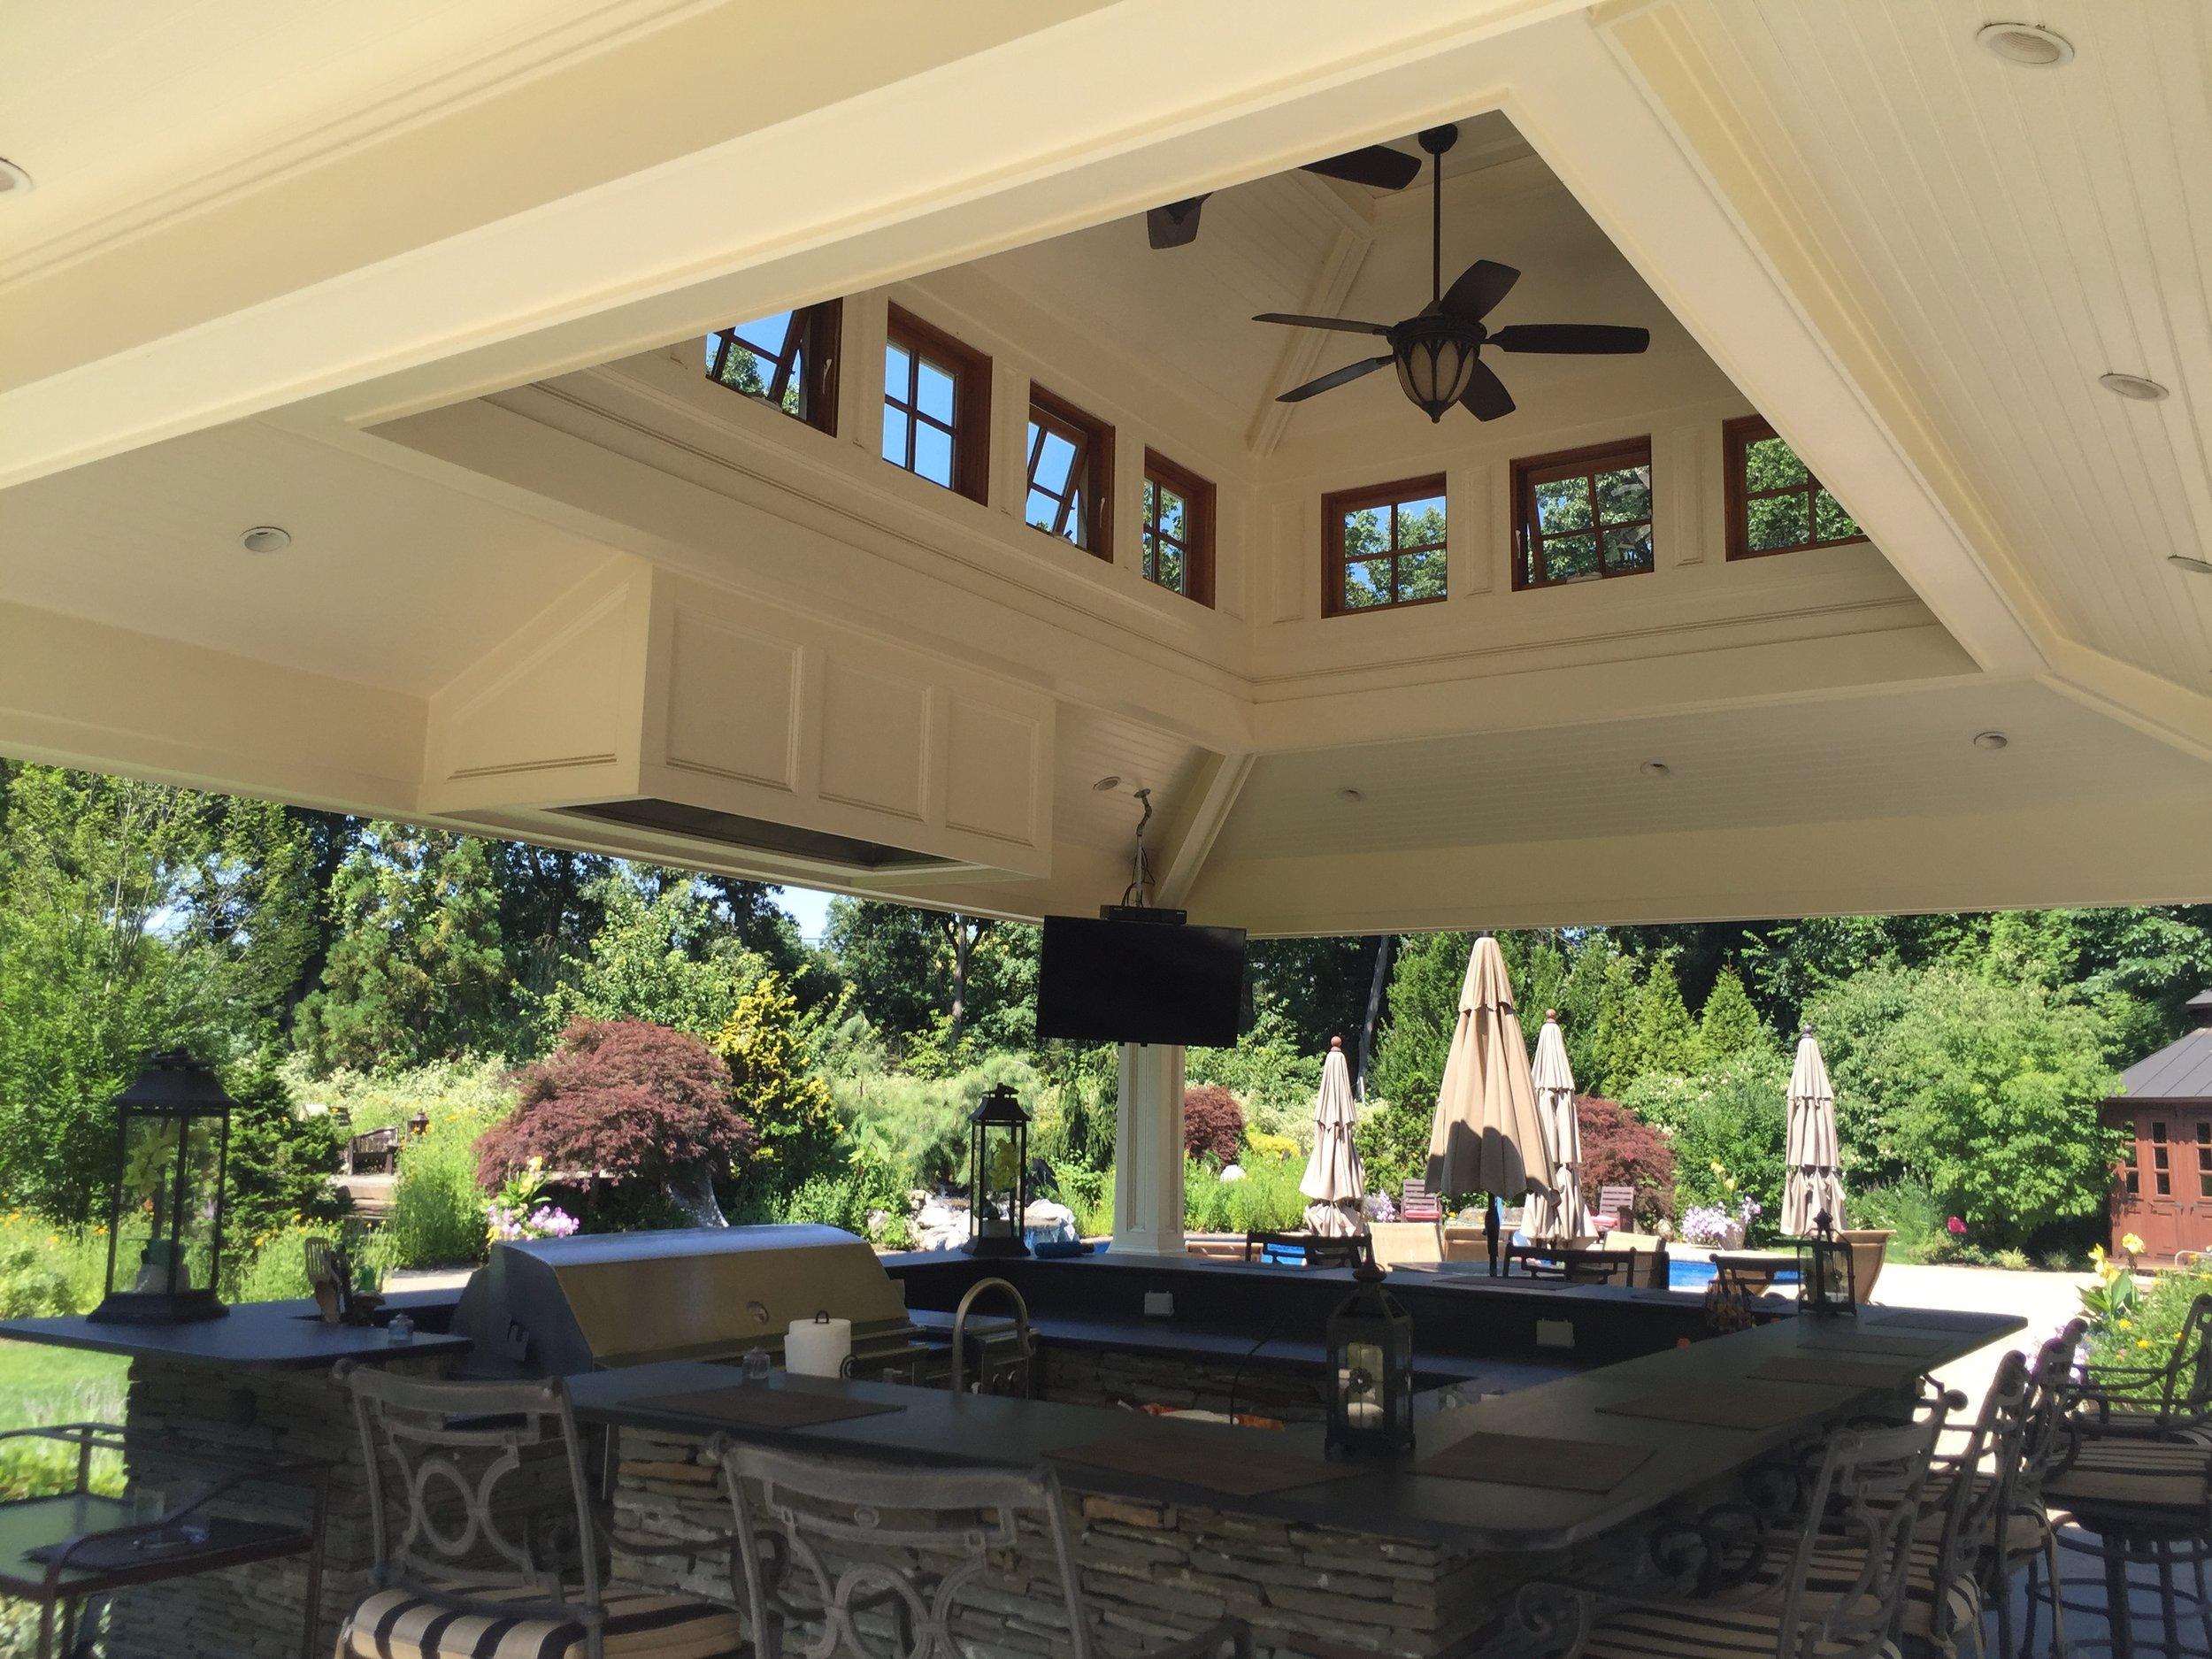 Professional landscape design company with outdoor kitchen cabanain Long Island, NY